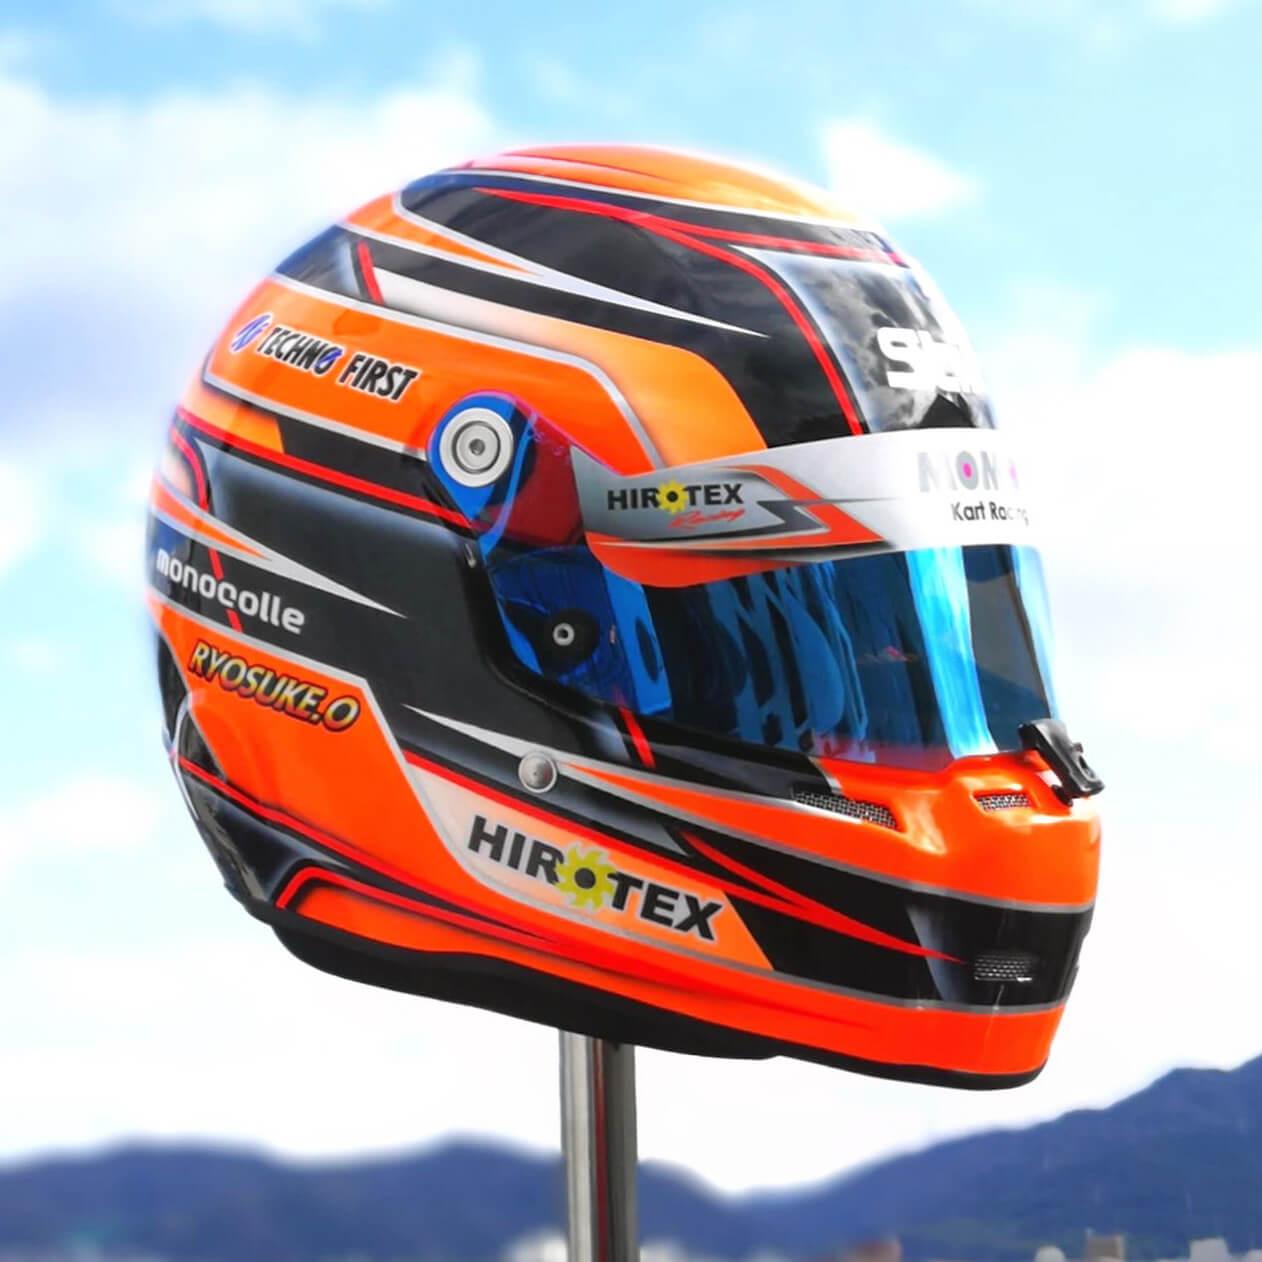 STILO 軽量 レーシングカート用ヘルメット ST5 CMR